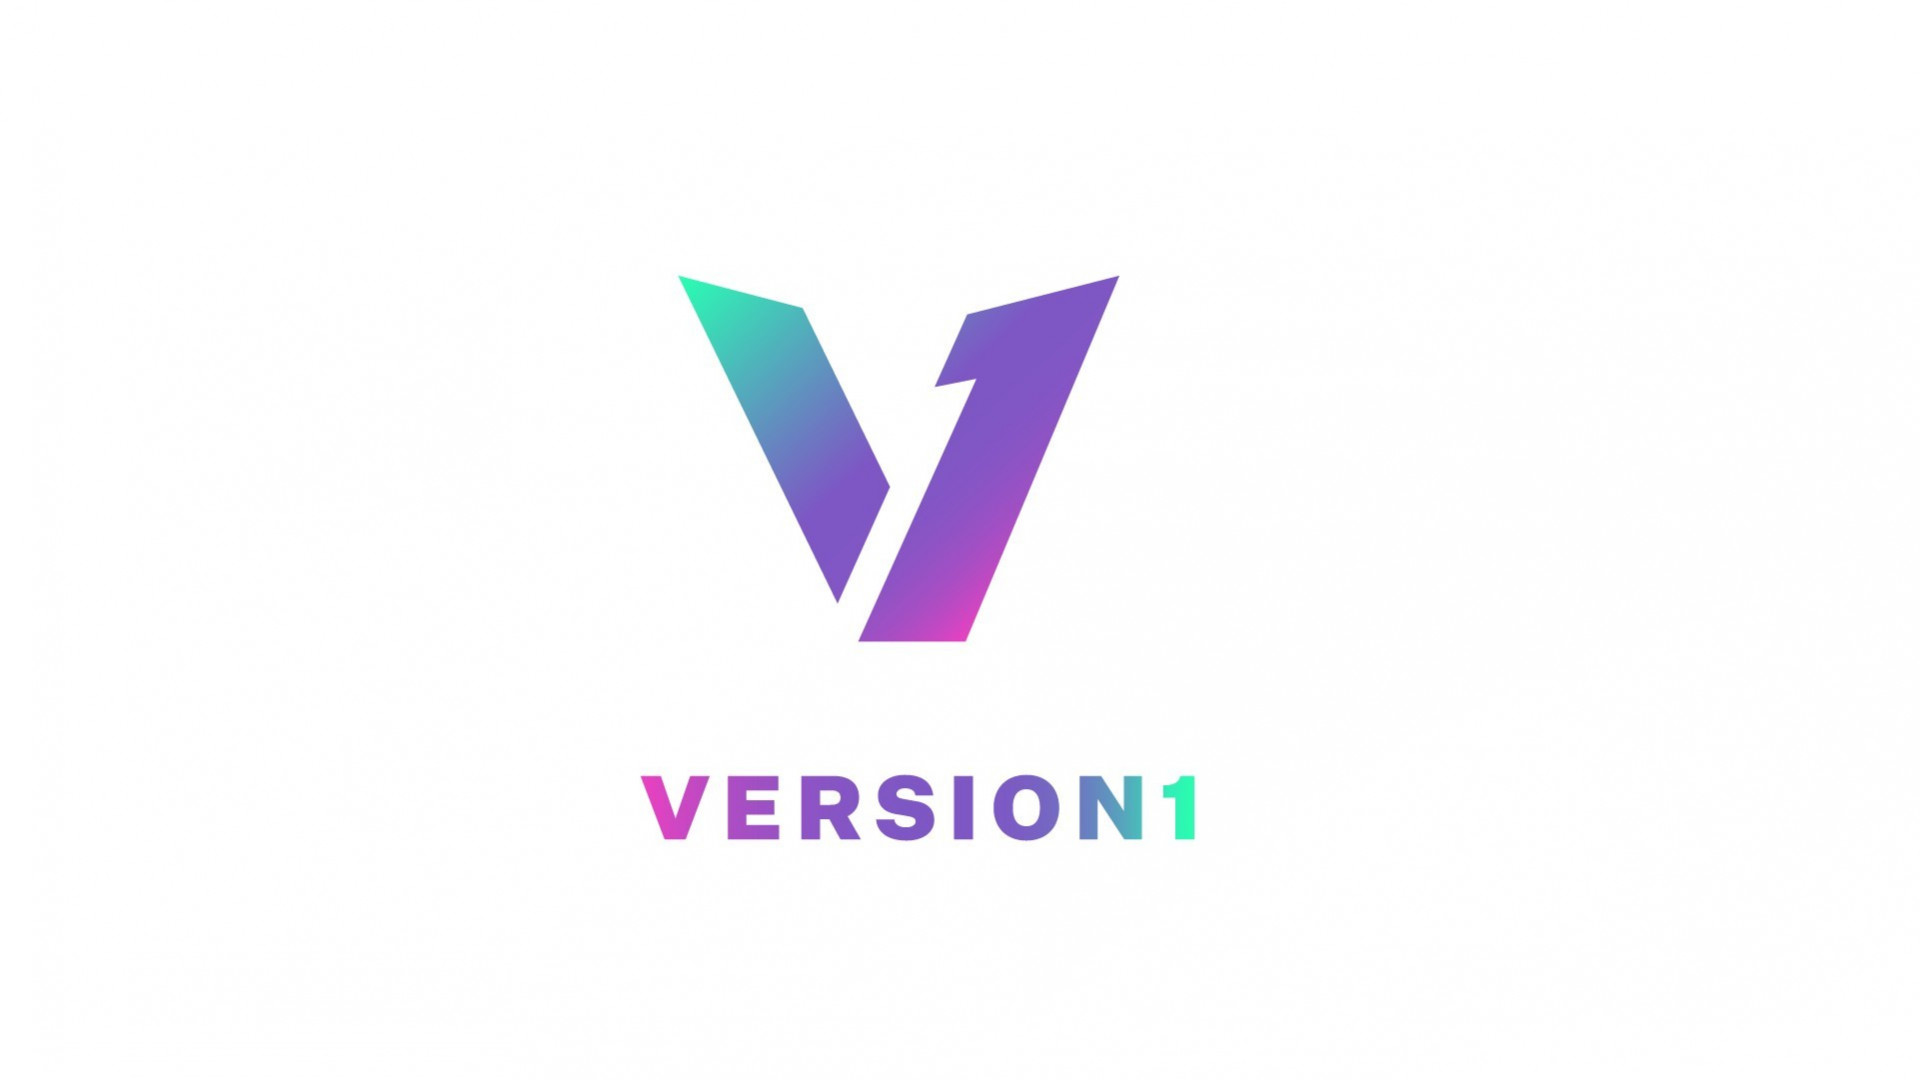 WISE Ventures Esports rebrands to Version1 – Esports Insider